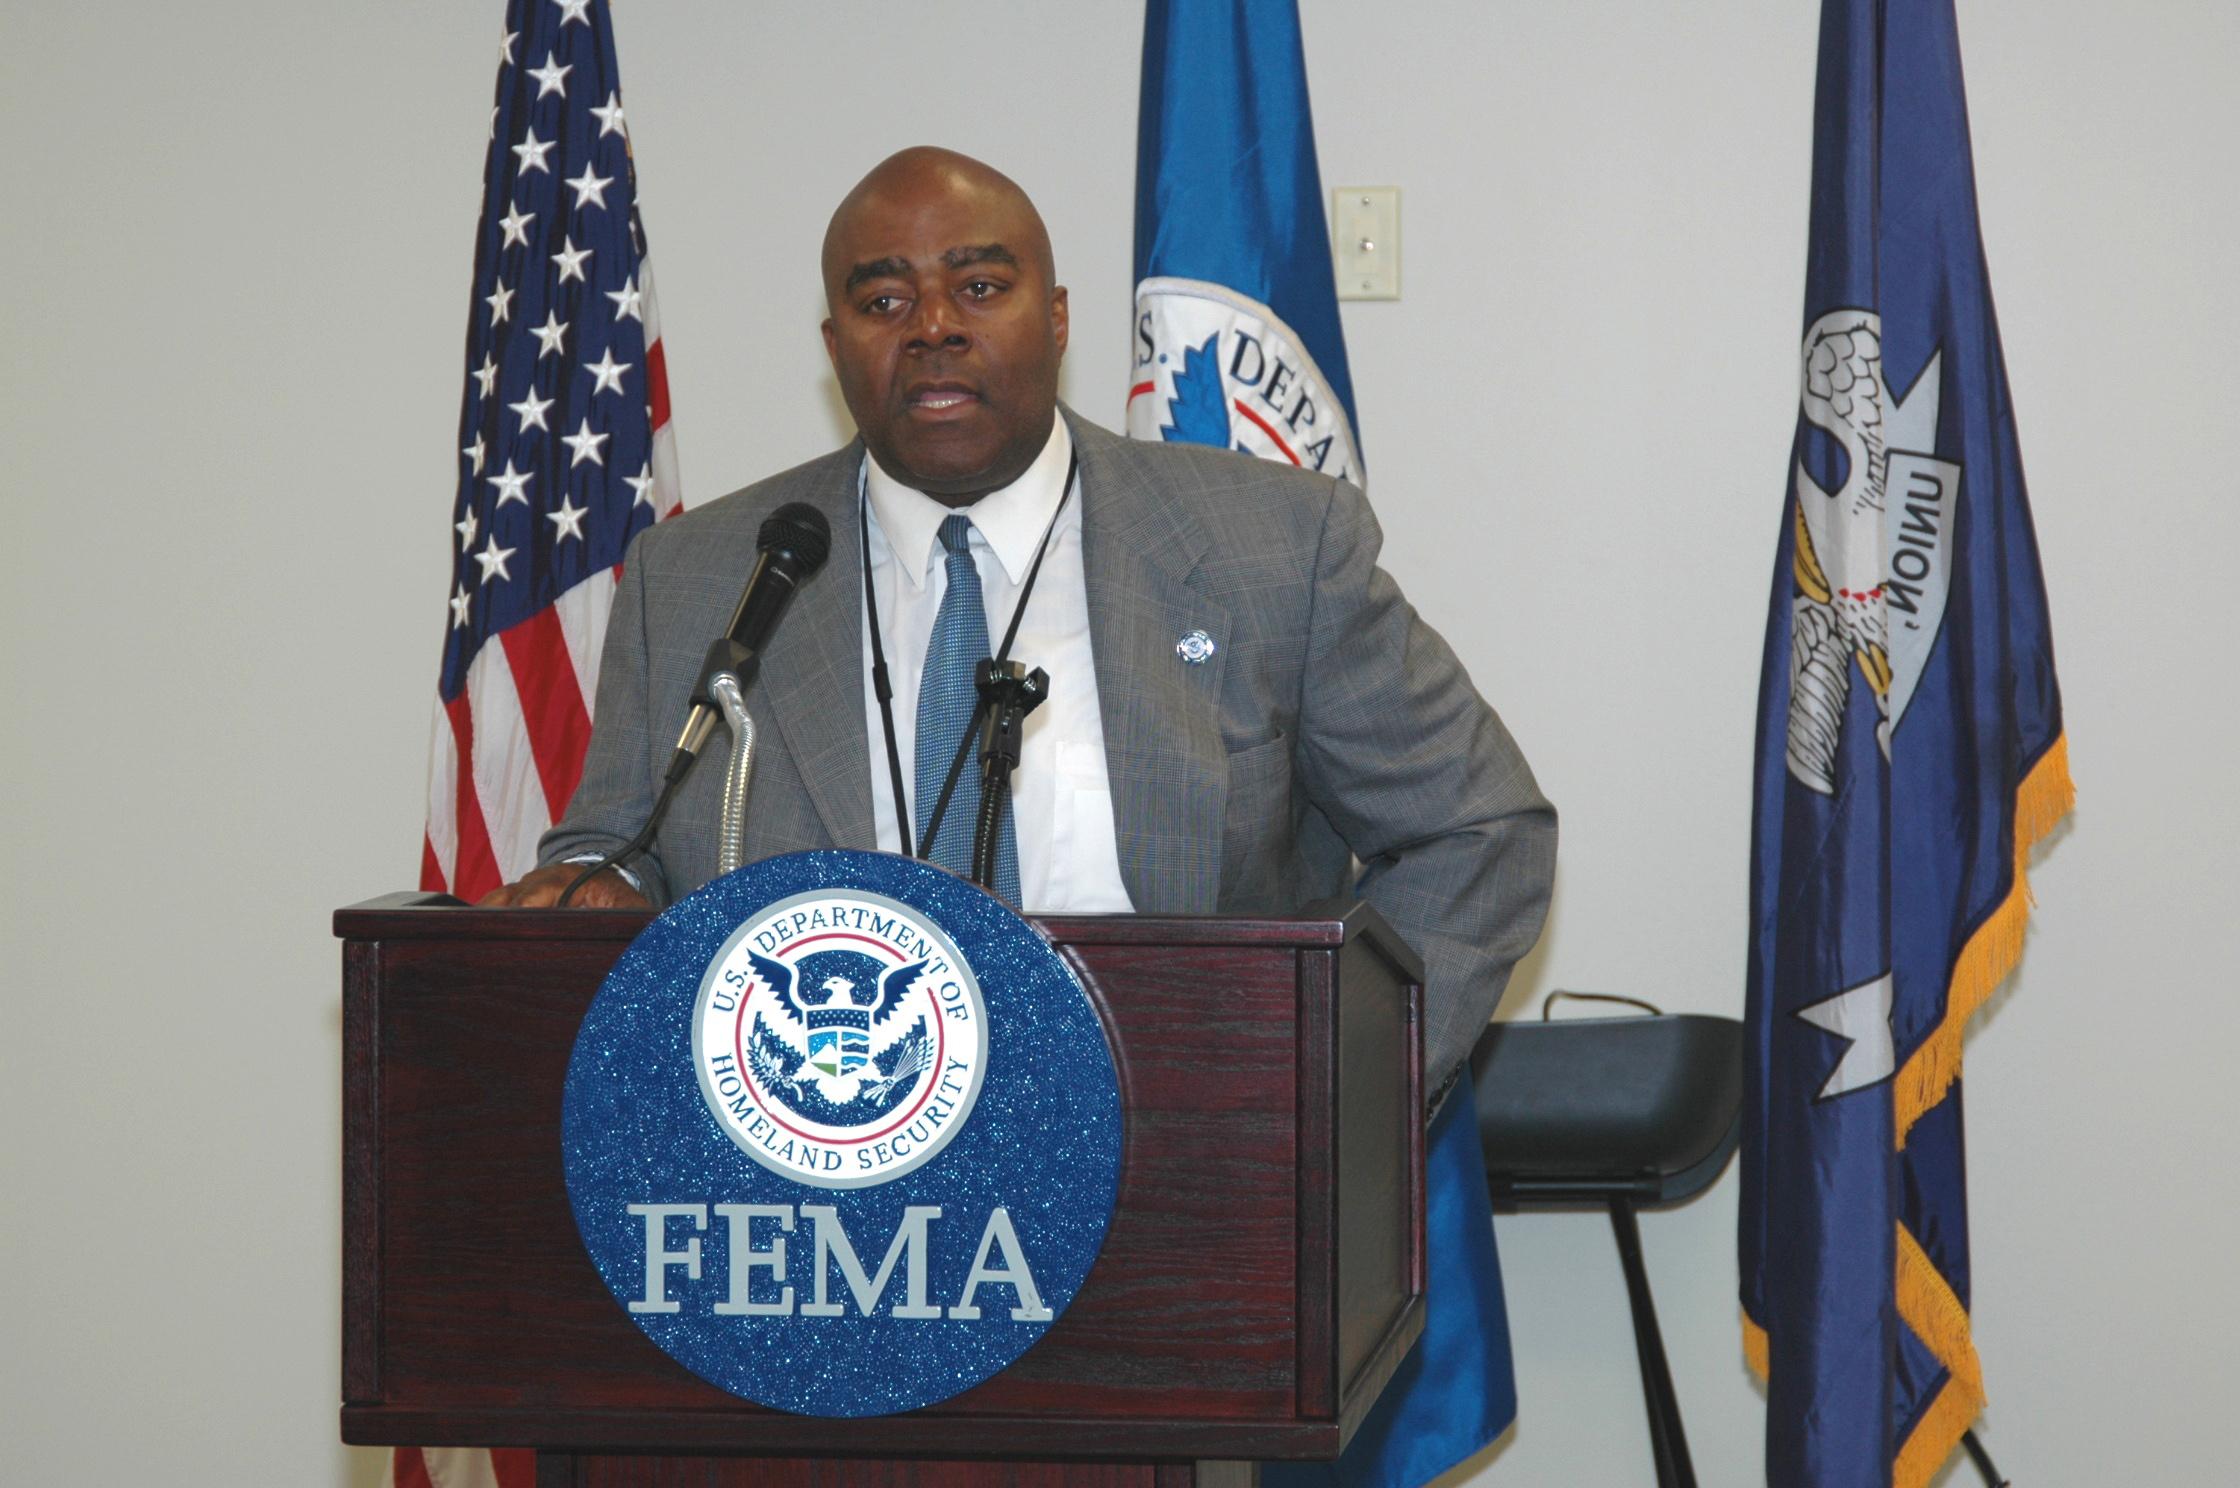 FEMA - 46225 - FEMA Baton Rouge, Louisiana Recovery Office renovated.jpg English: Baton Rouge, LA, March 3, 2011 -- FEMA Region 6 Administrator